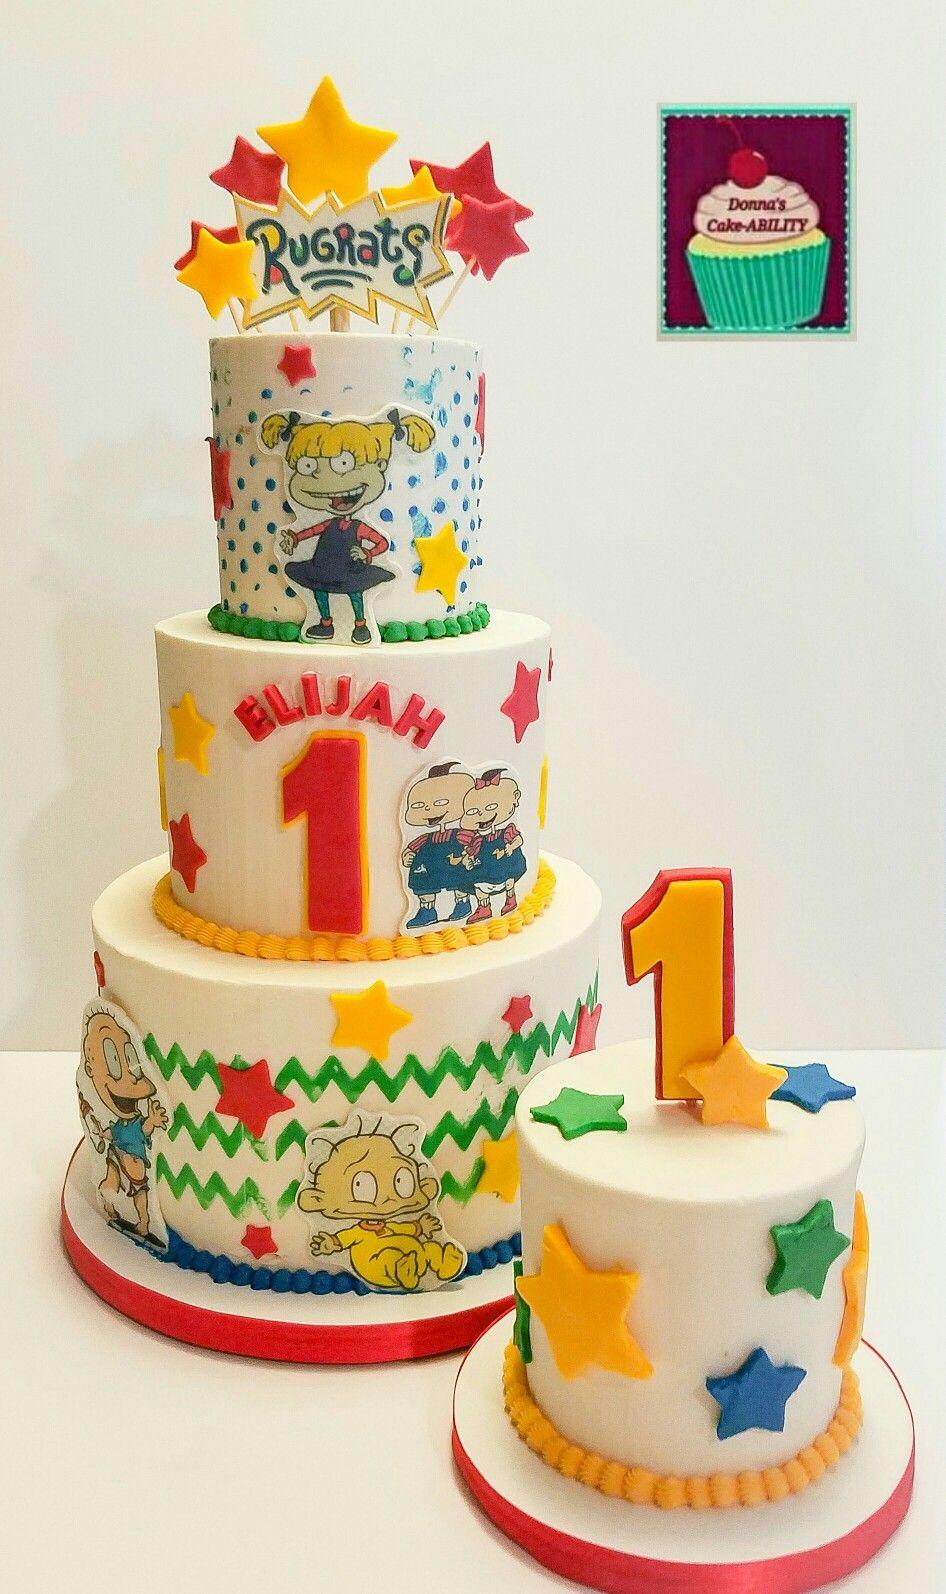 Rugrats Cake And Smash Cake Rugrats Theme Party Pinterest